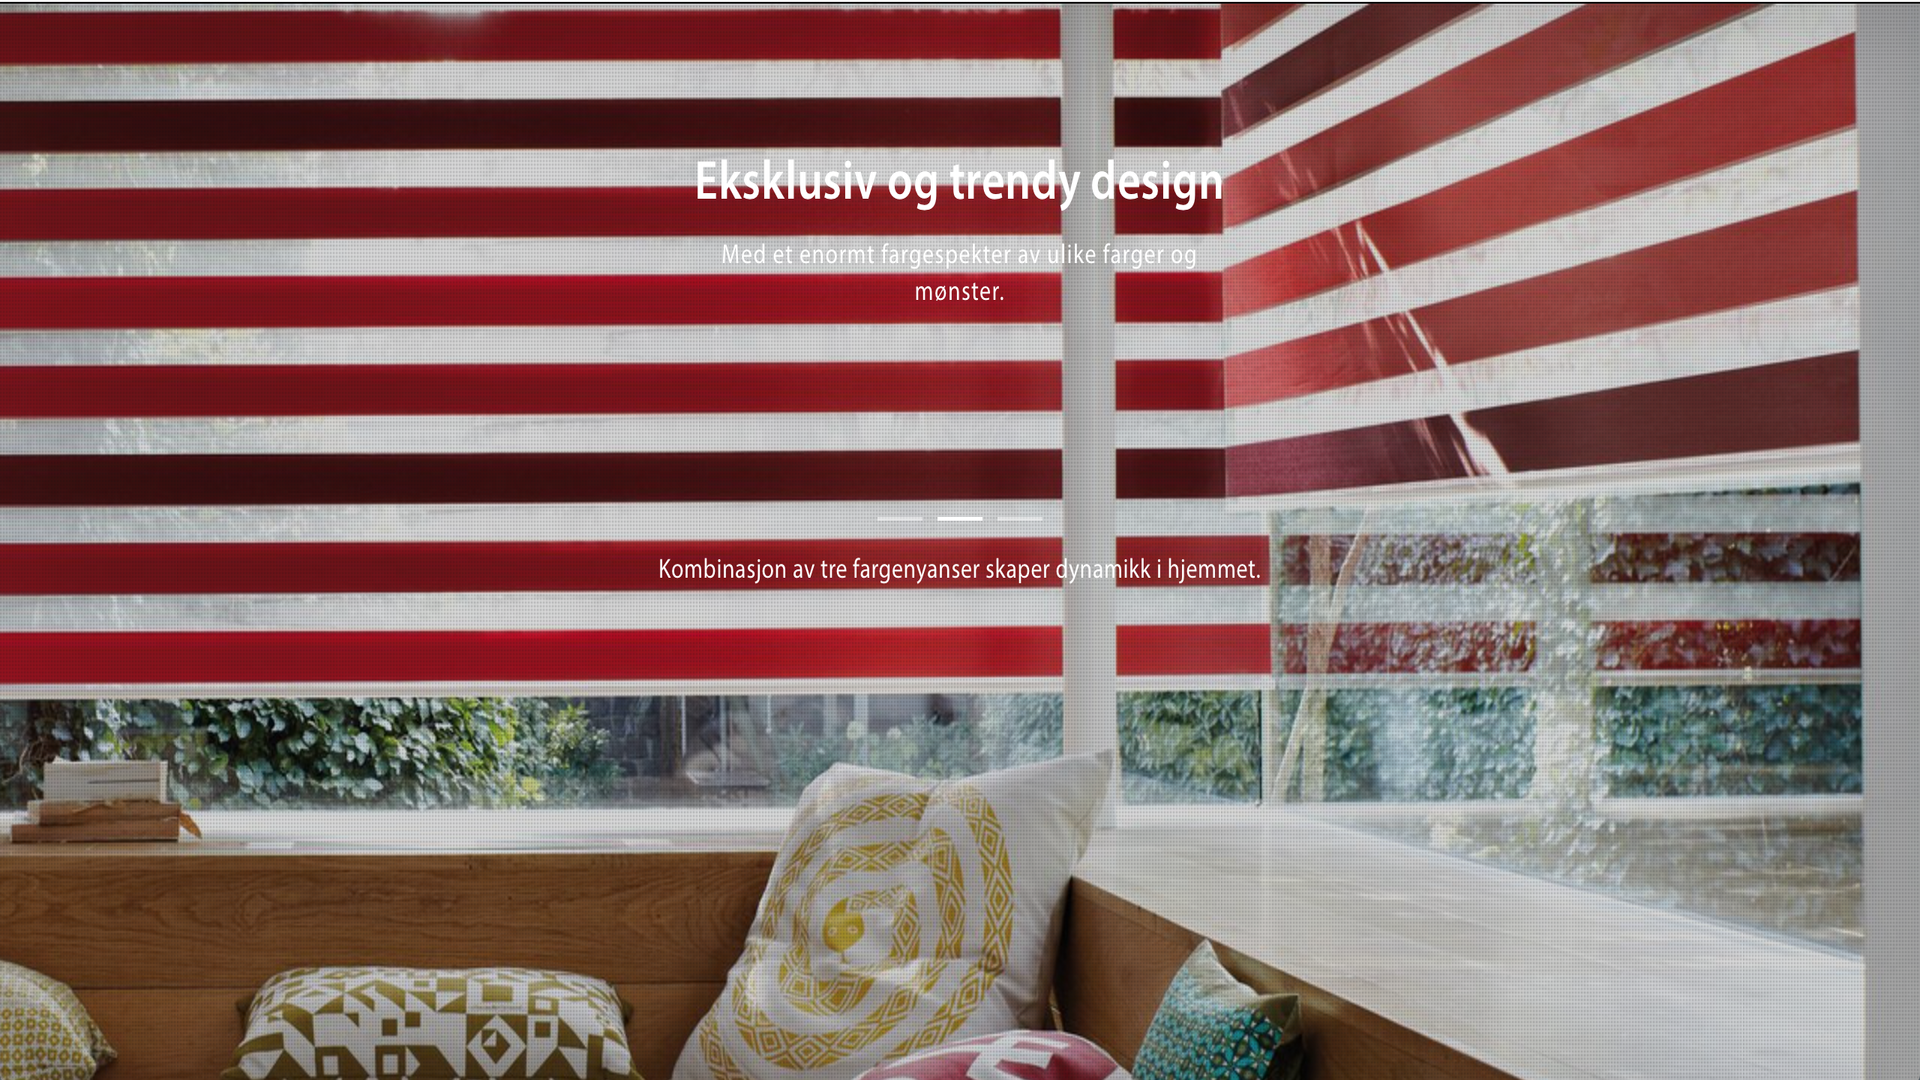 Eksklusiv og trendy design